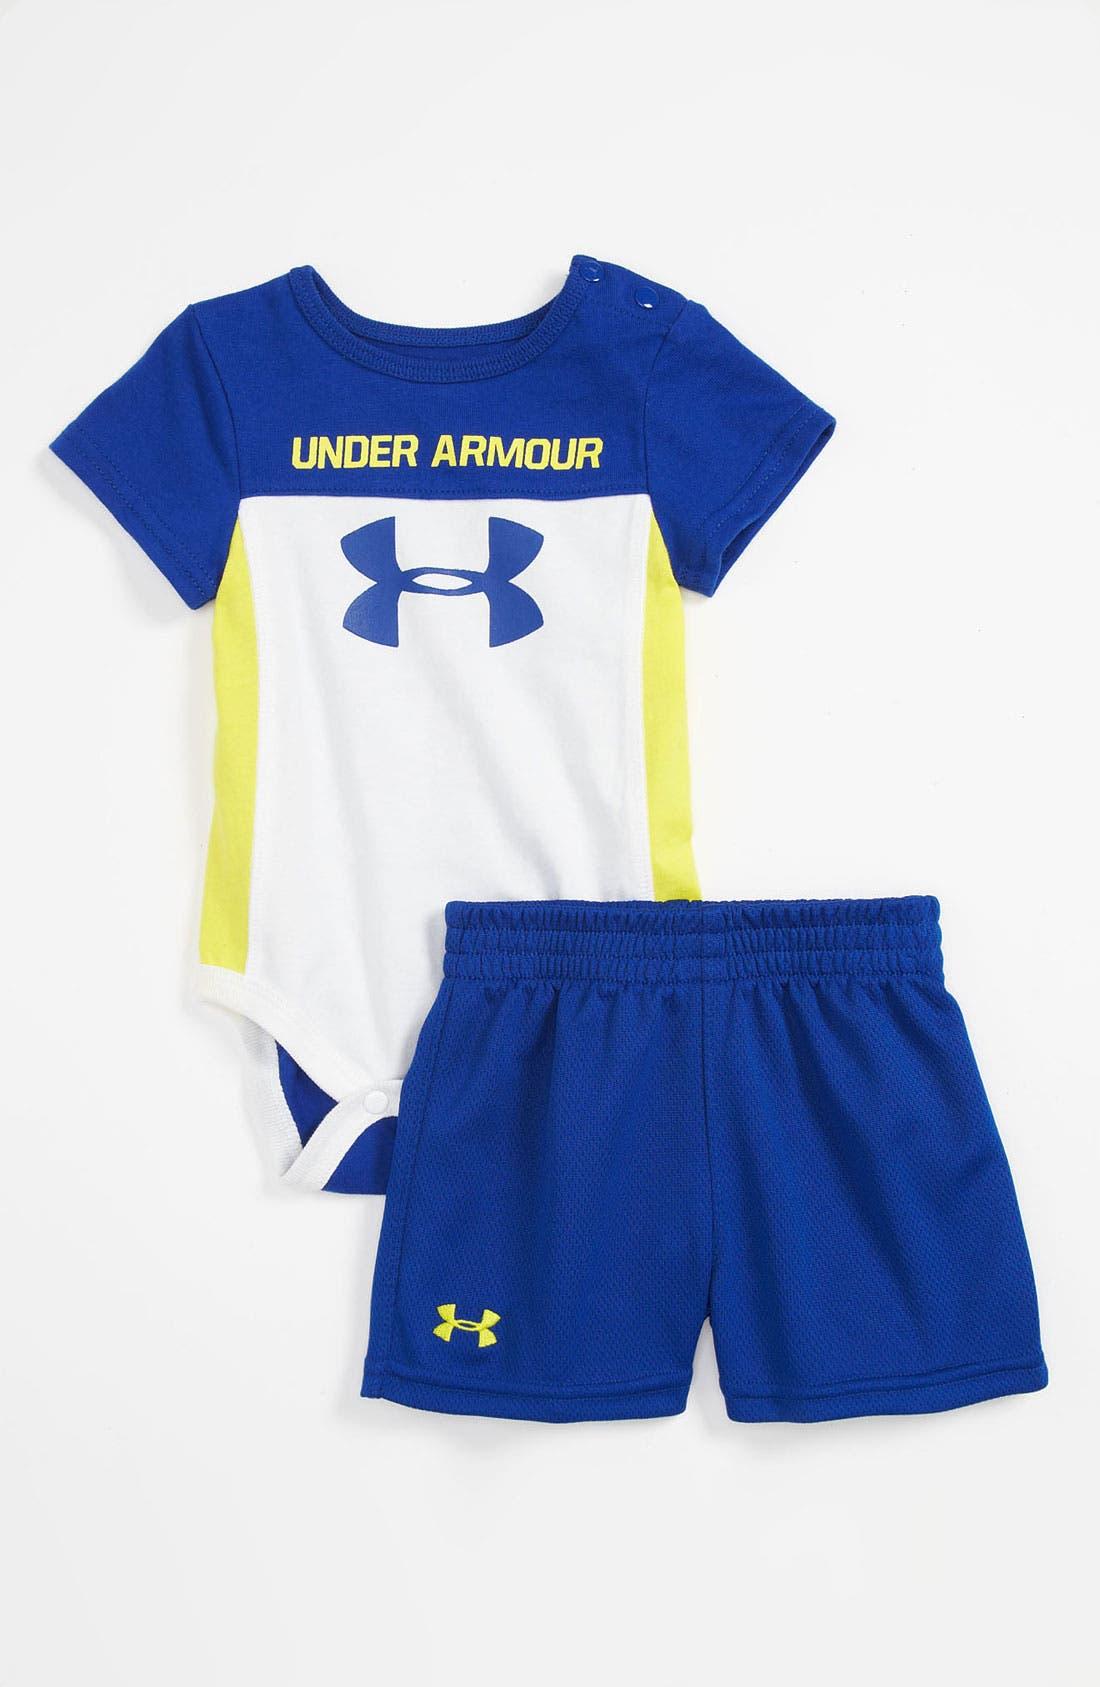 Main Image - Under Armour Bodysuit & Shorts (Infant)